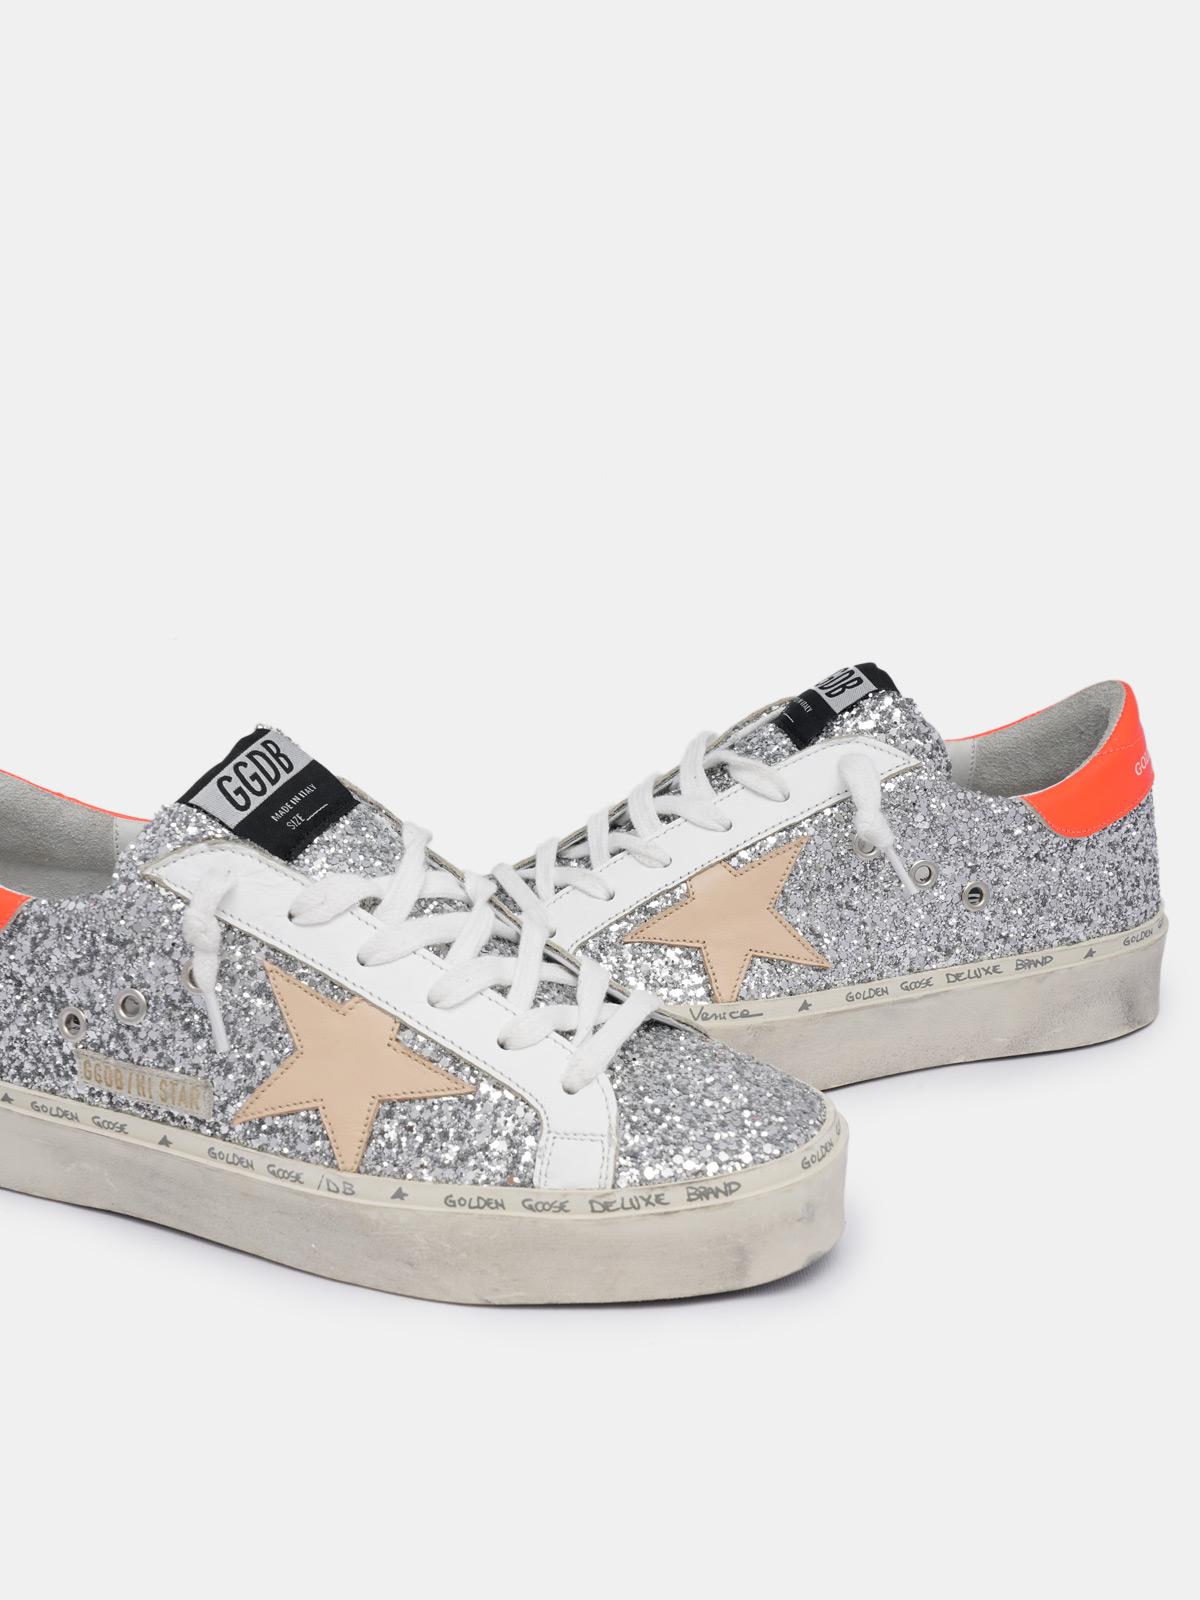 Golden Goose - Hi Star sneakers with glitter and orange heel tab in